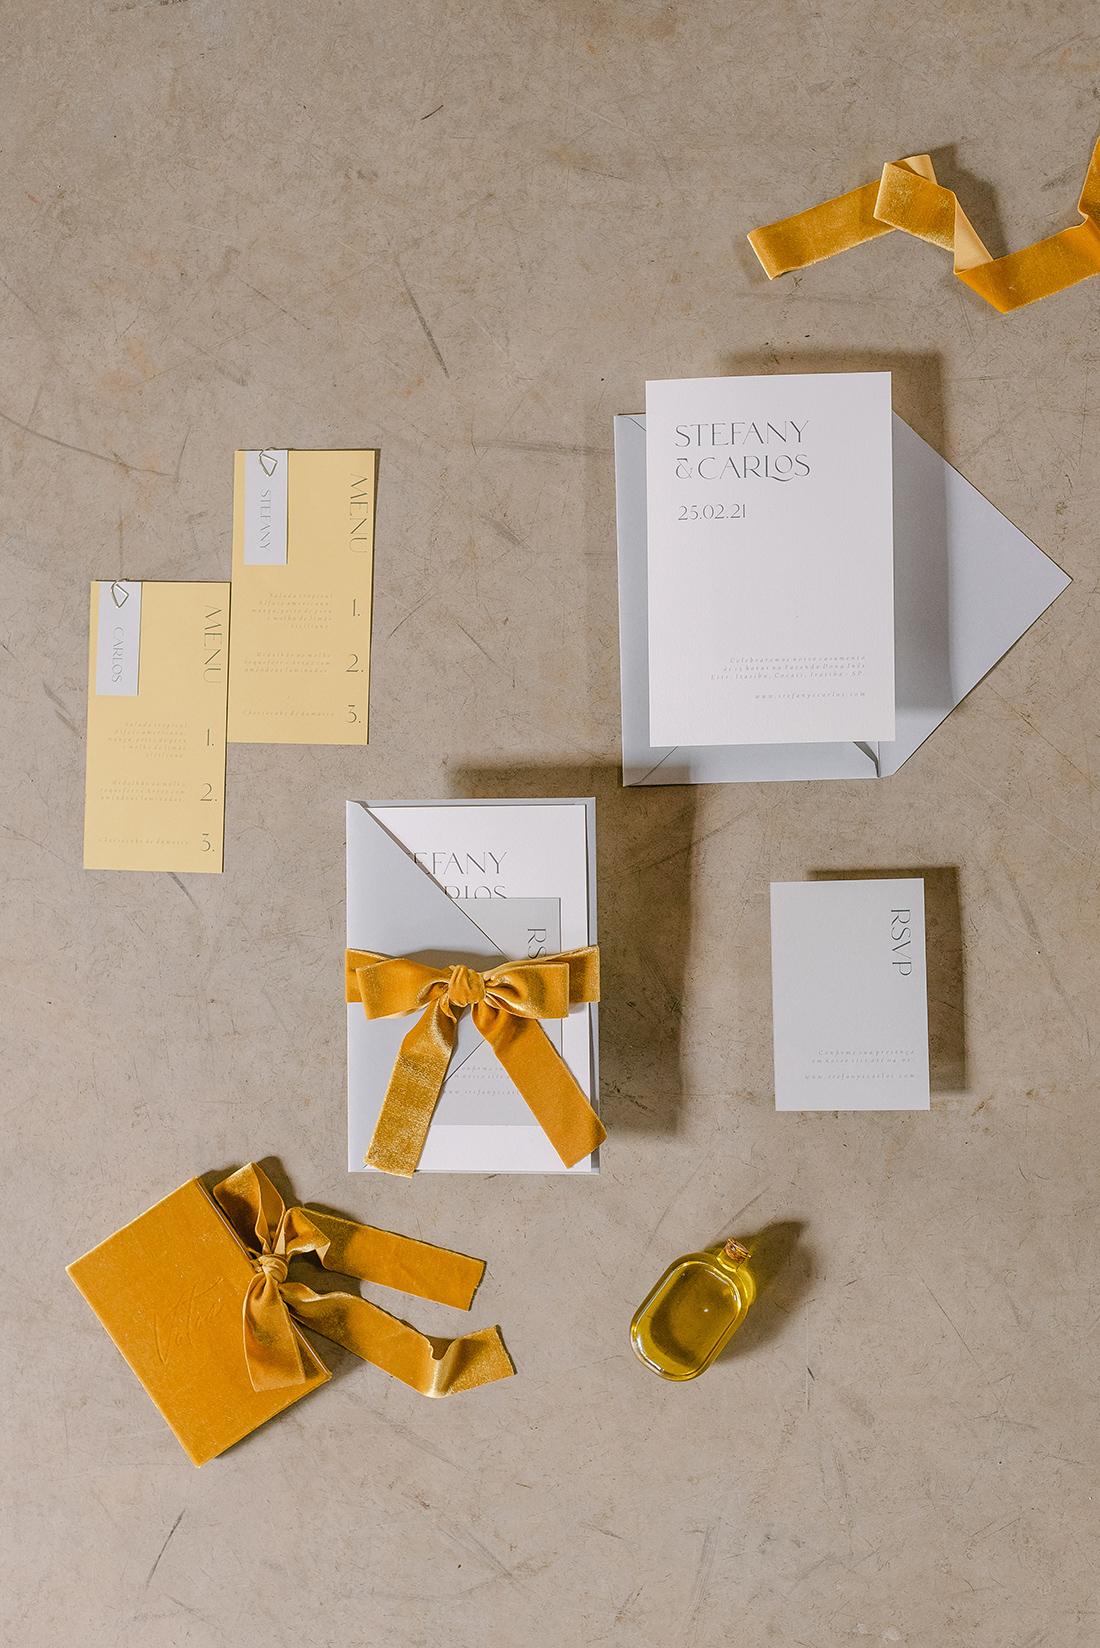 Editorial Yellow & Gray Noiva Ansiosa - Pantone 2021 - Amarelo e Cinza - Papelaria por Estudio Pinus